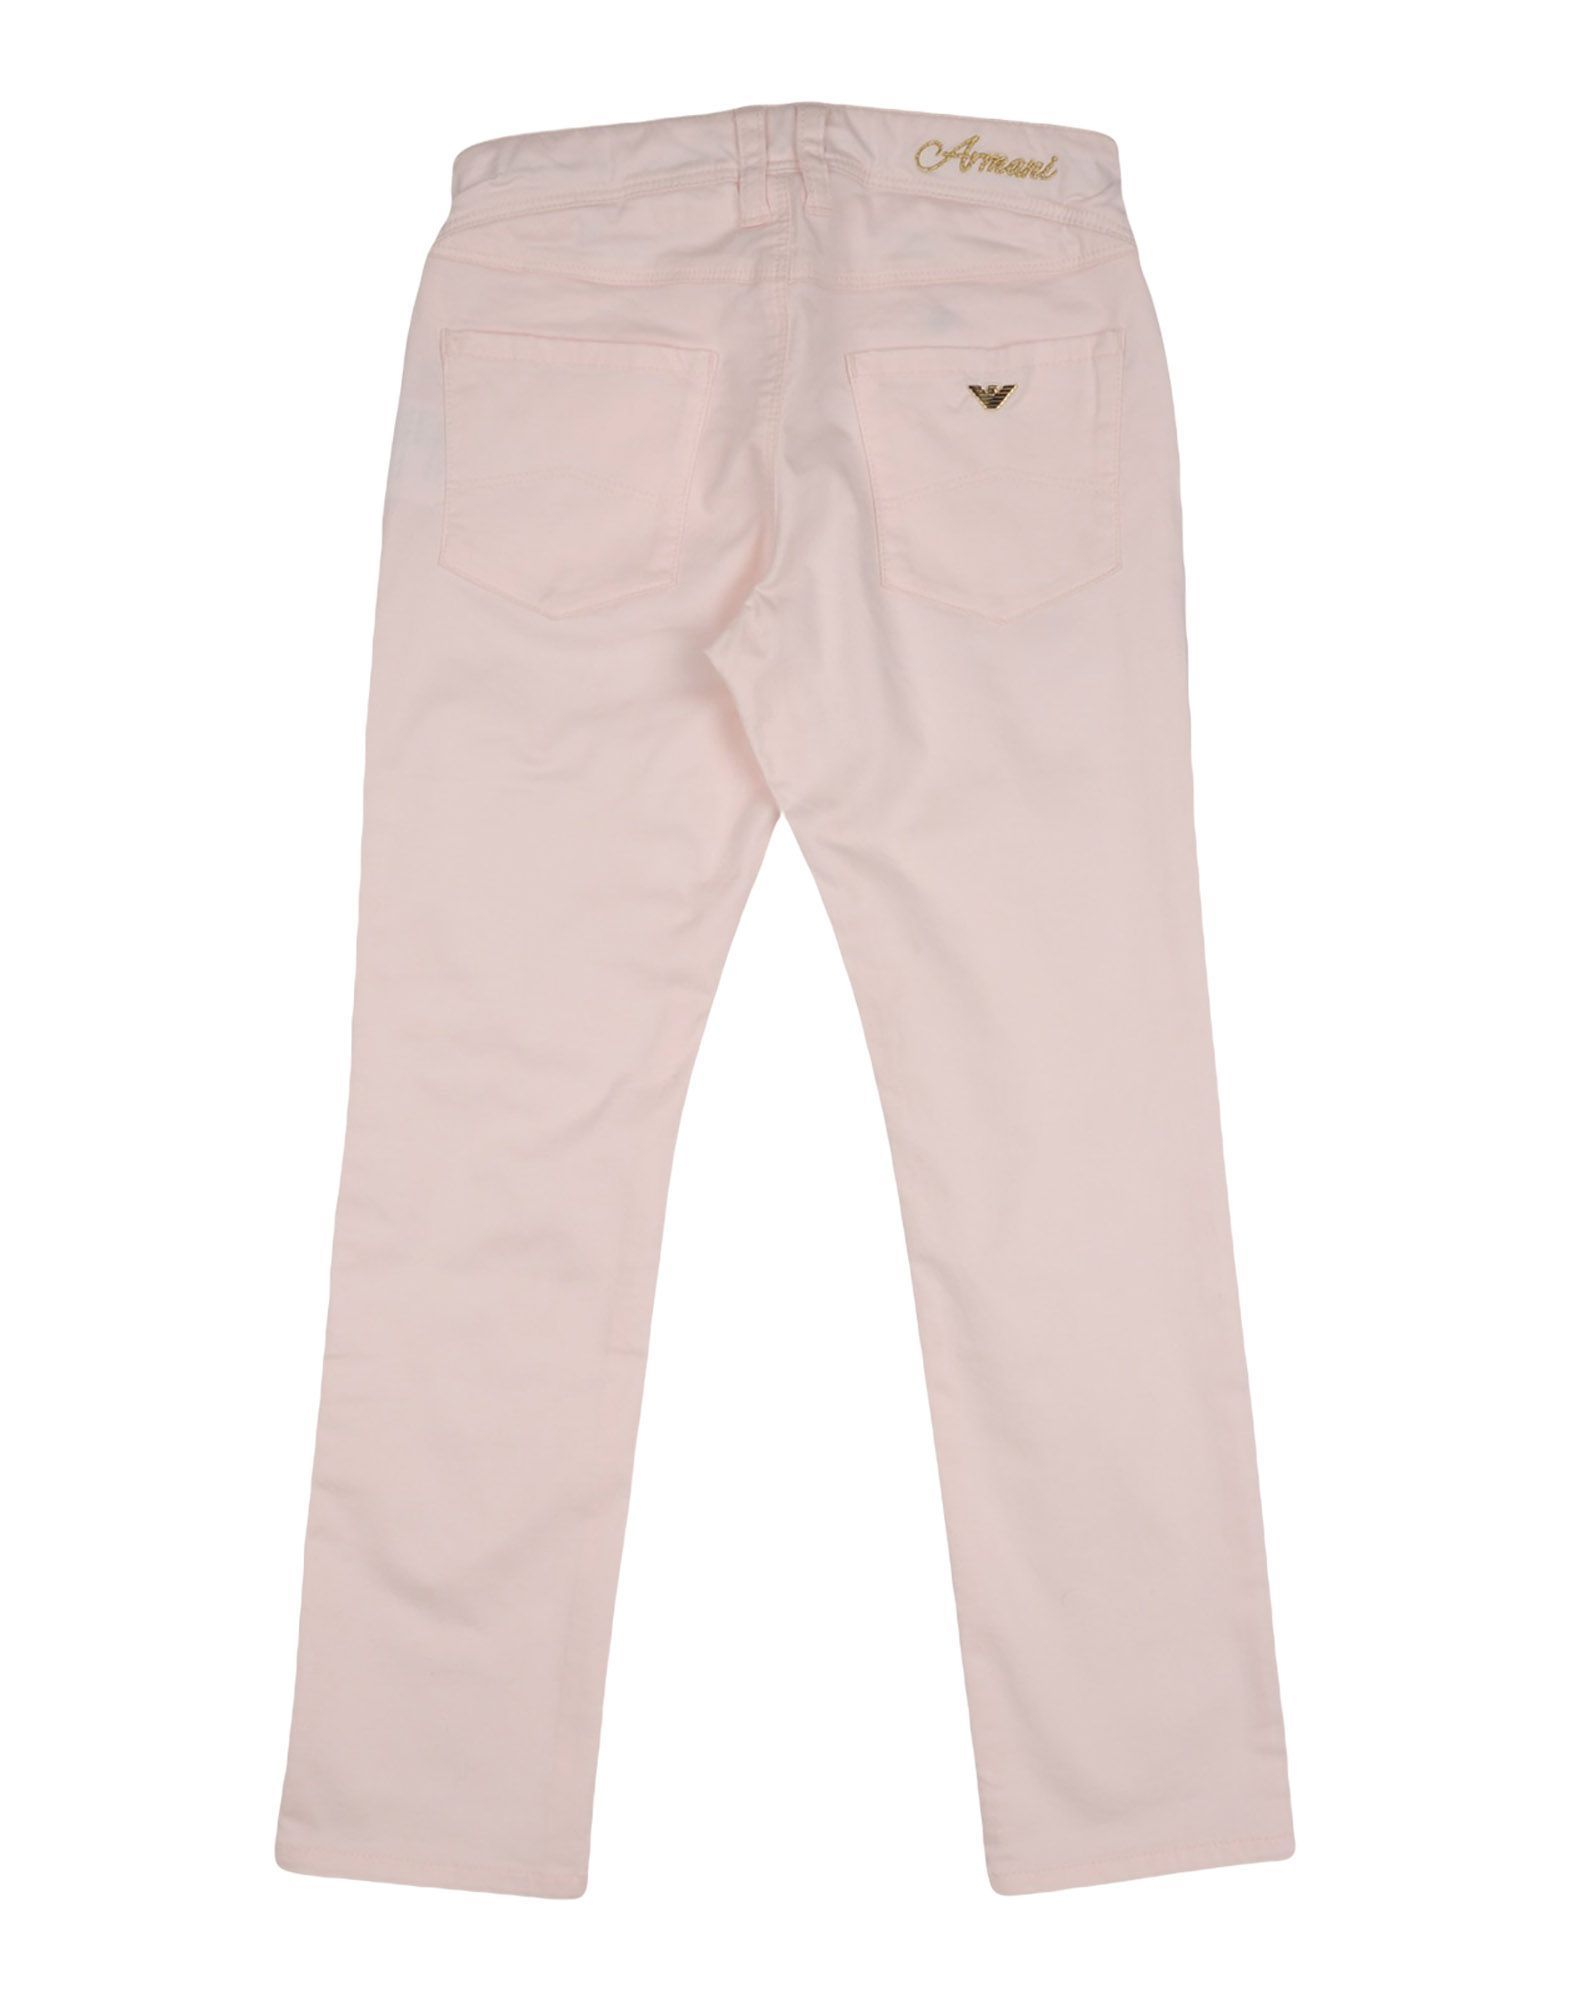 TROUSERS Armani Junior Light pink Girl Cotton